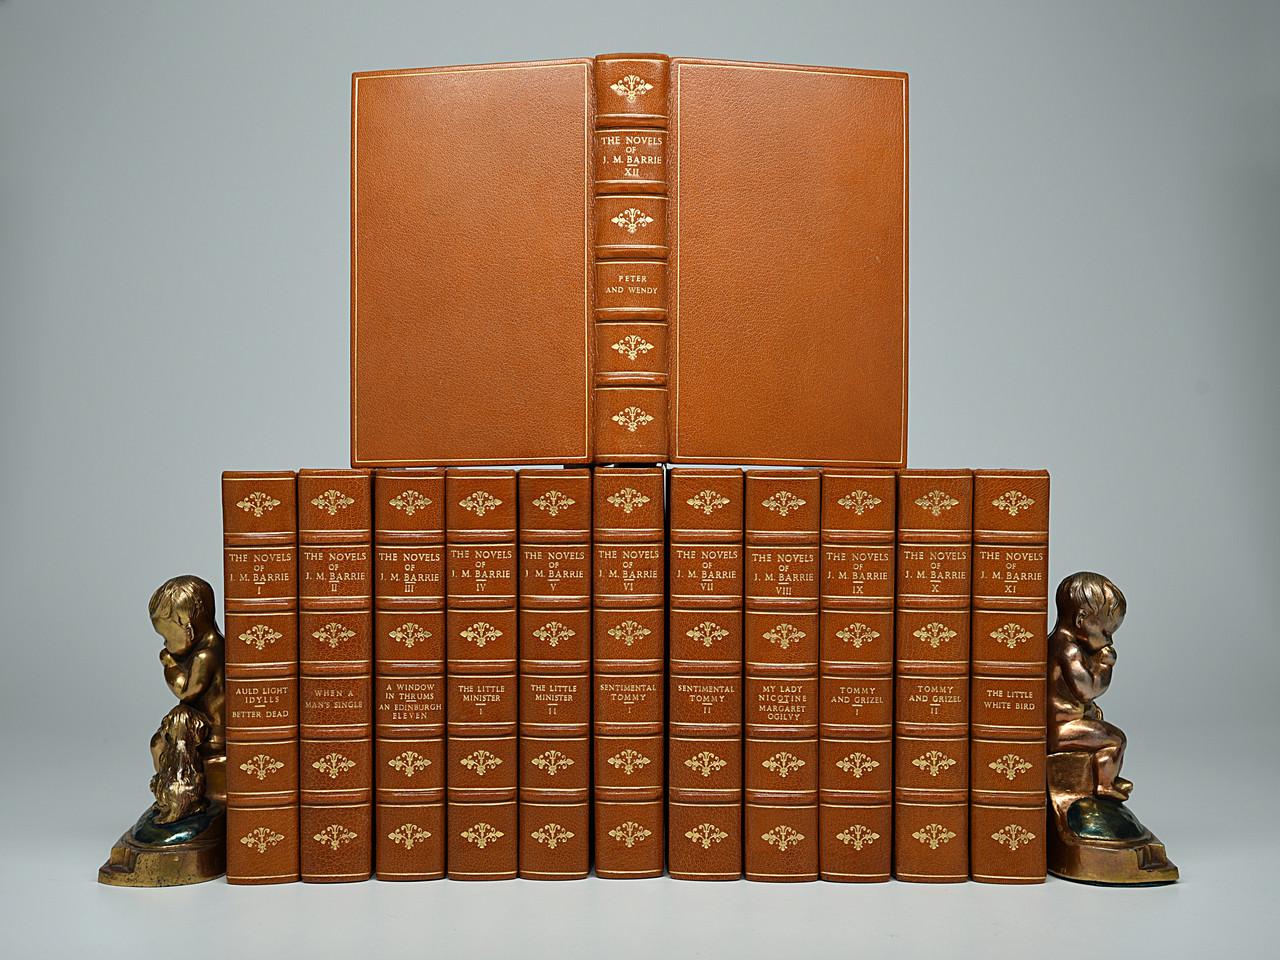 The Novels, Tales & Sketches of J. M. Barrie, 1912, Custom Full Leather Bindings